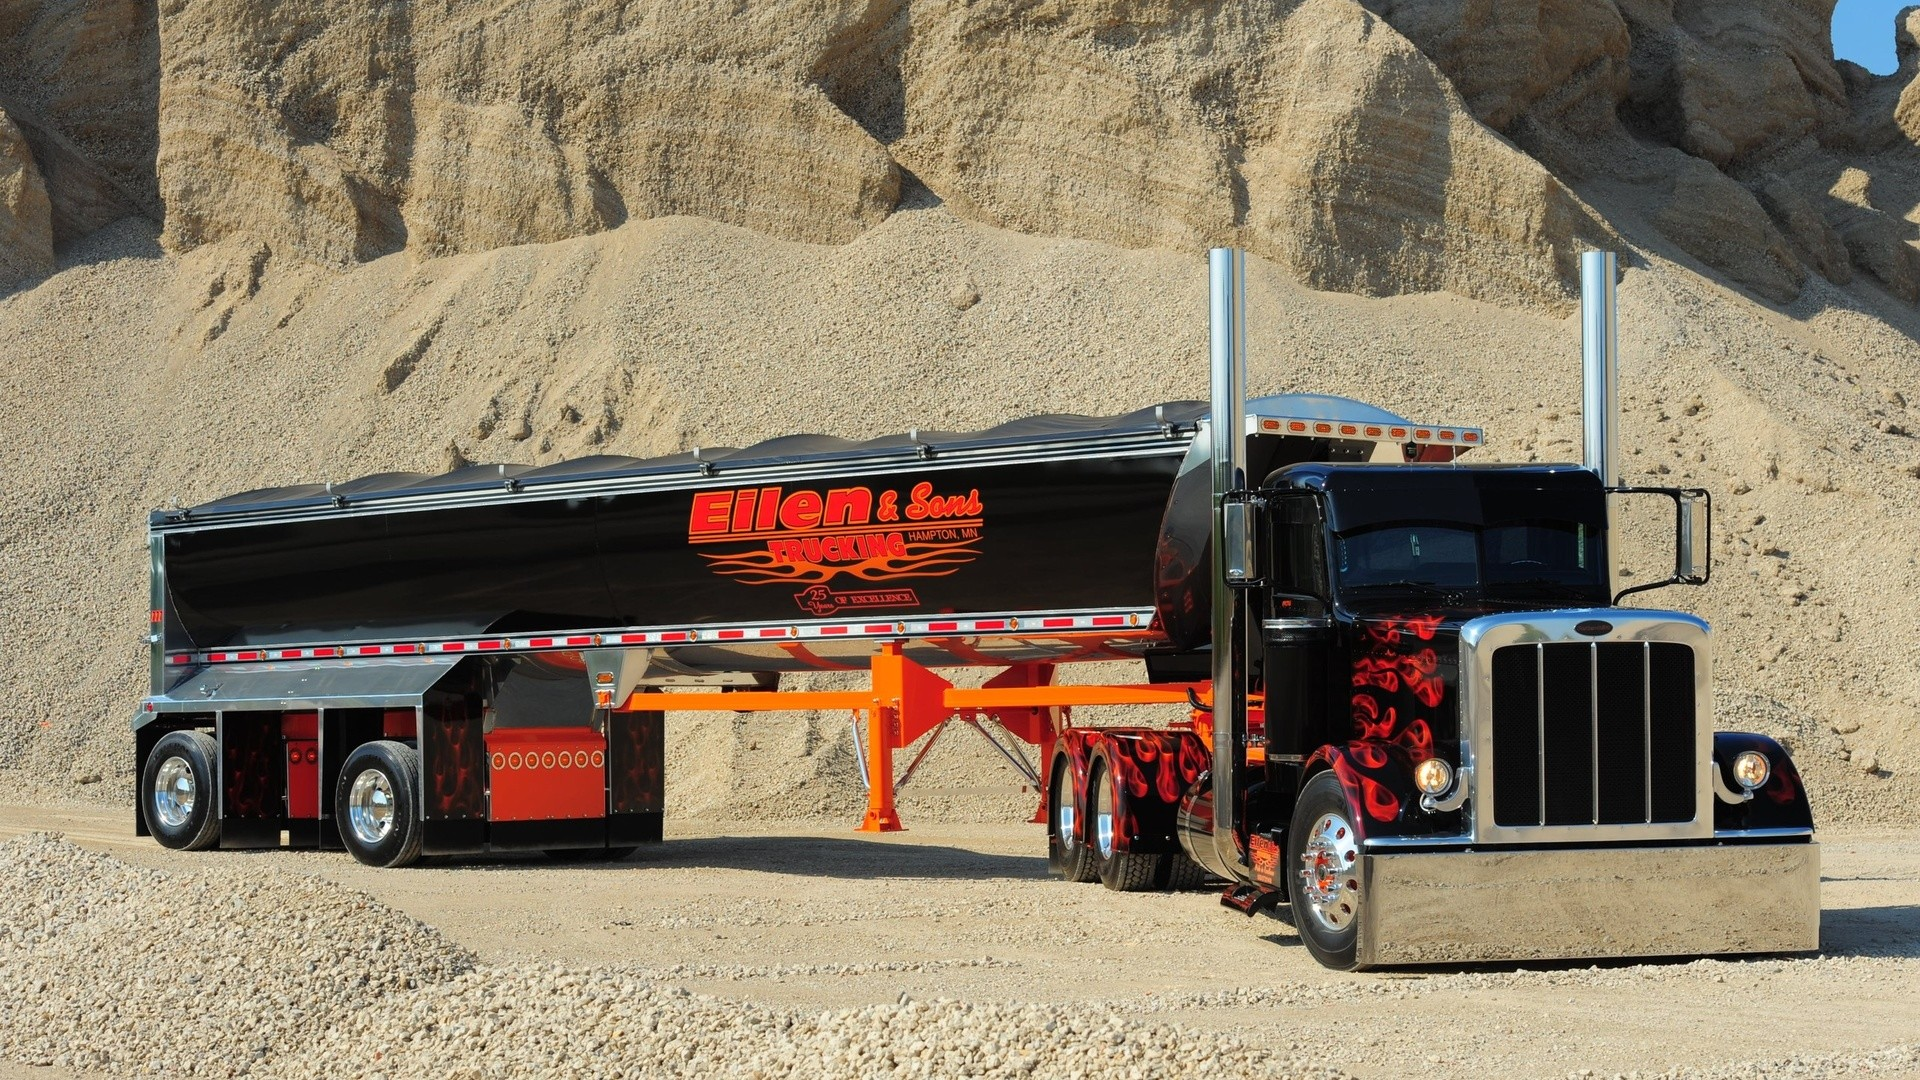 Peterbilt Trucks | Peterbilt semi trucks tractor rigs wallpaper |  | 53873 .